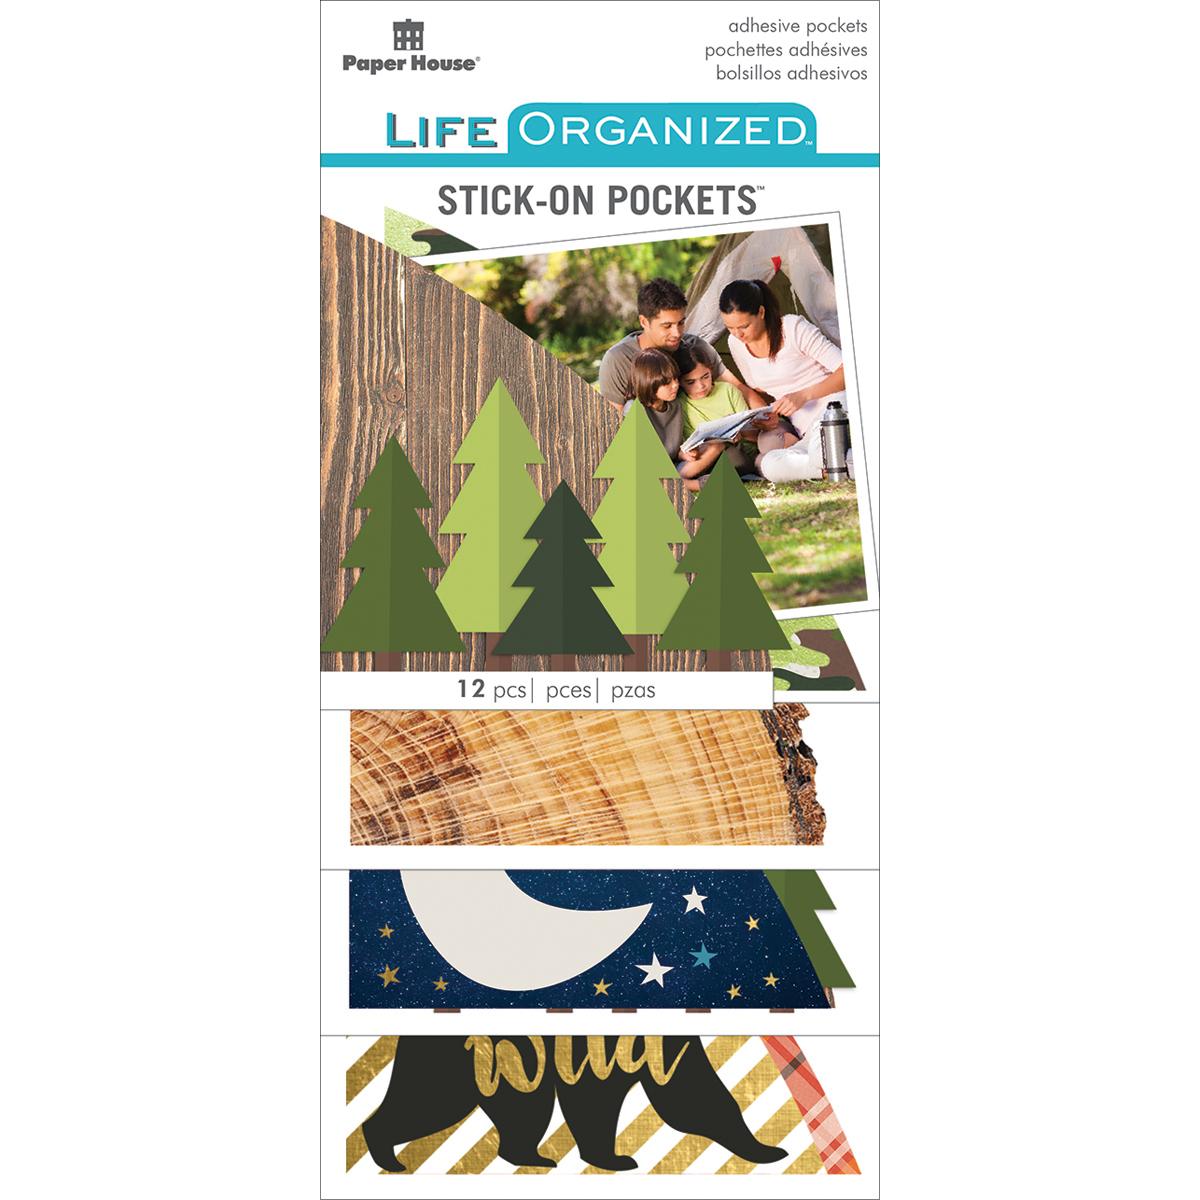 Life Organized Stick-on Pockets